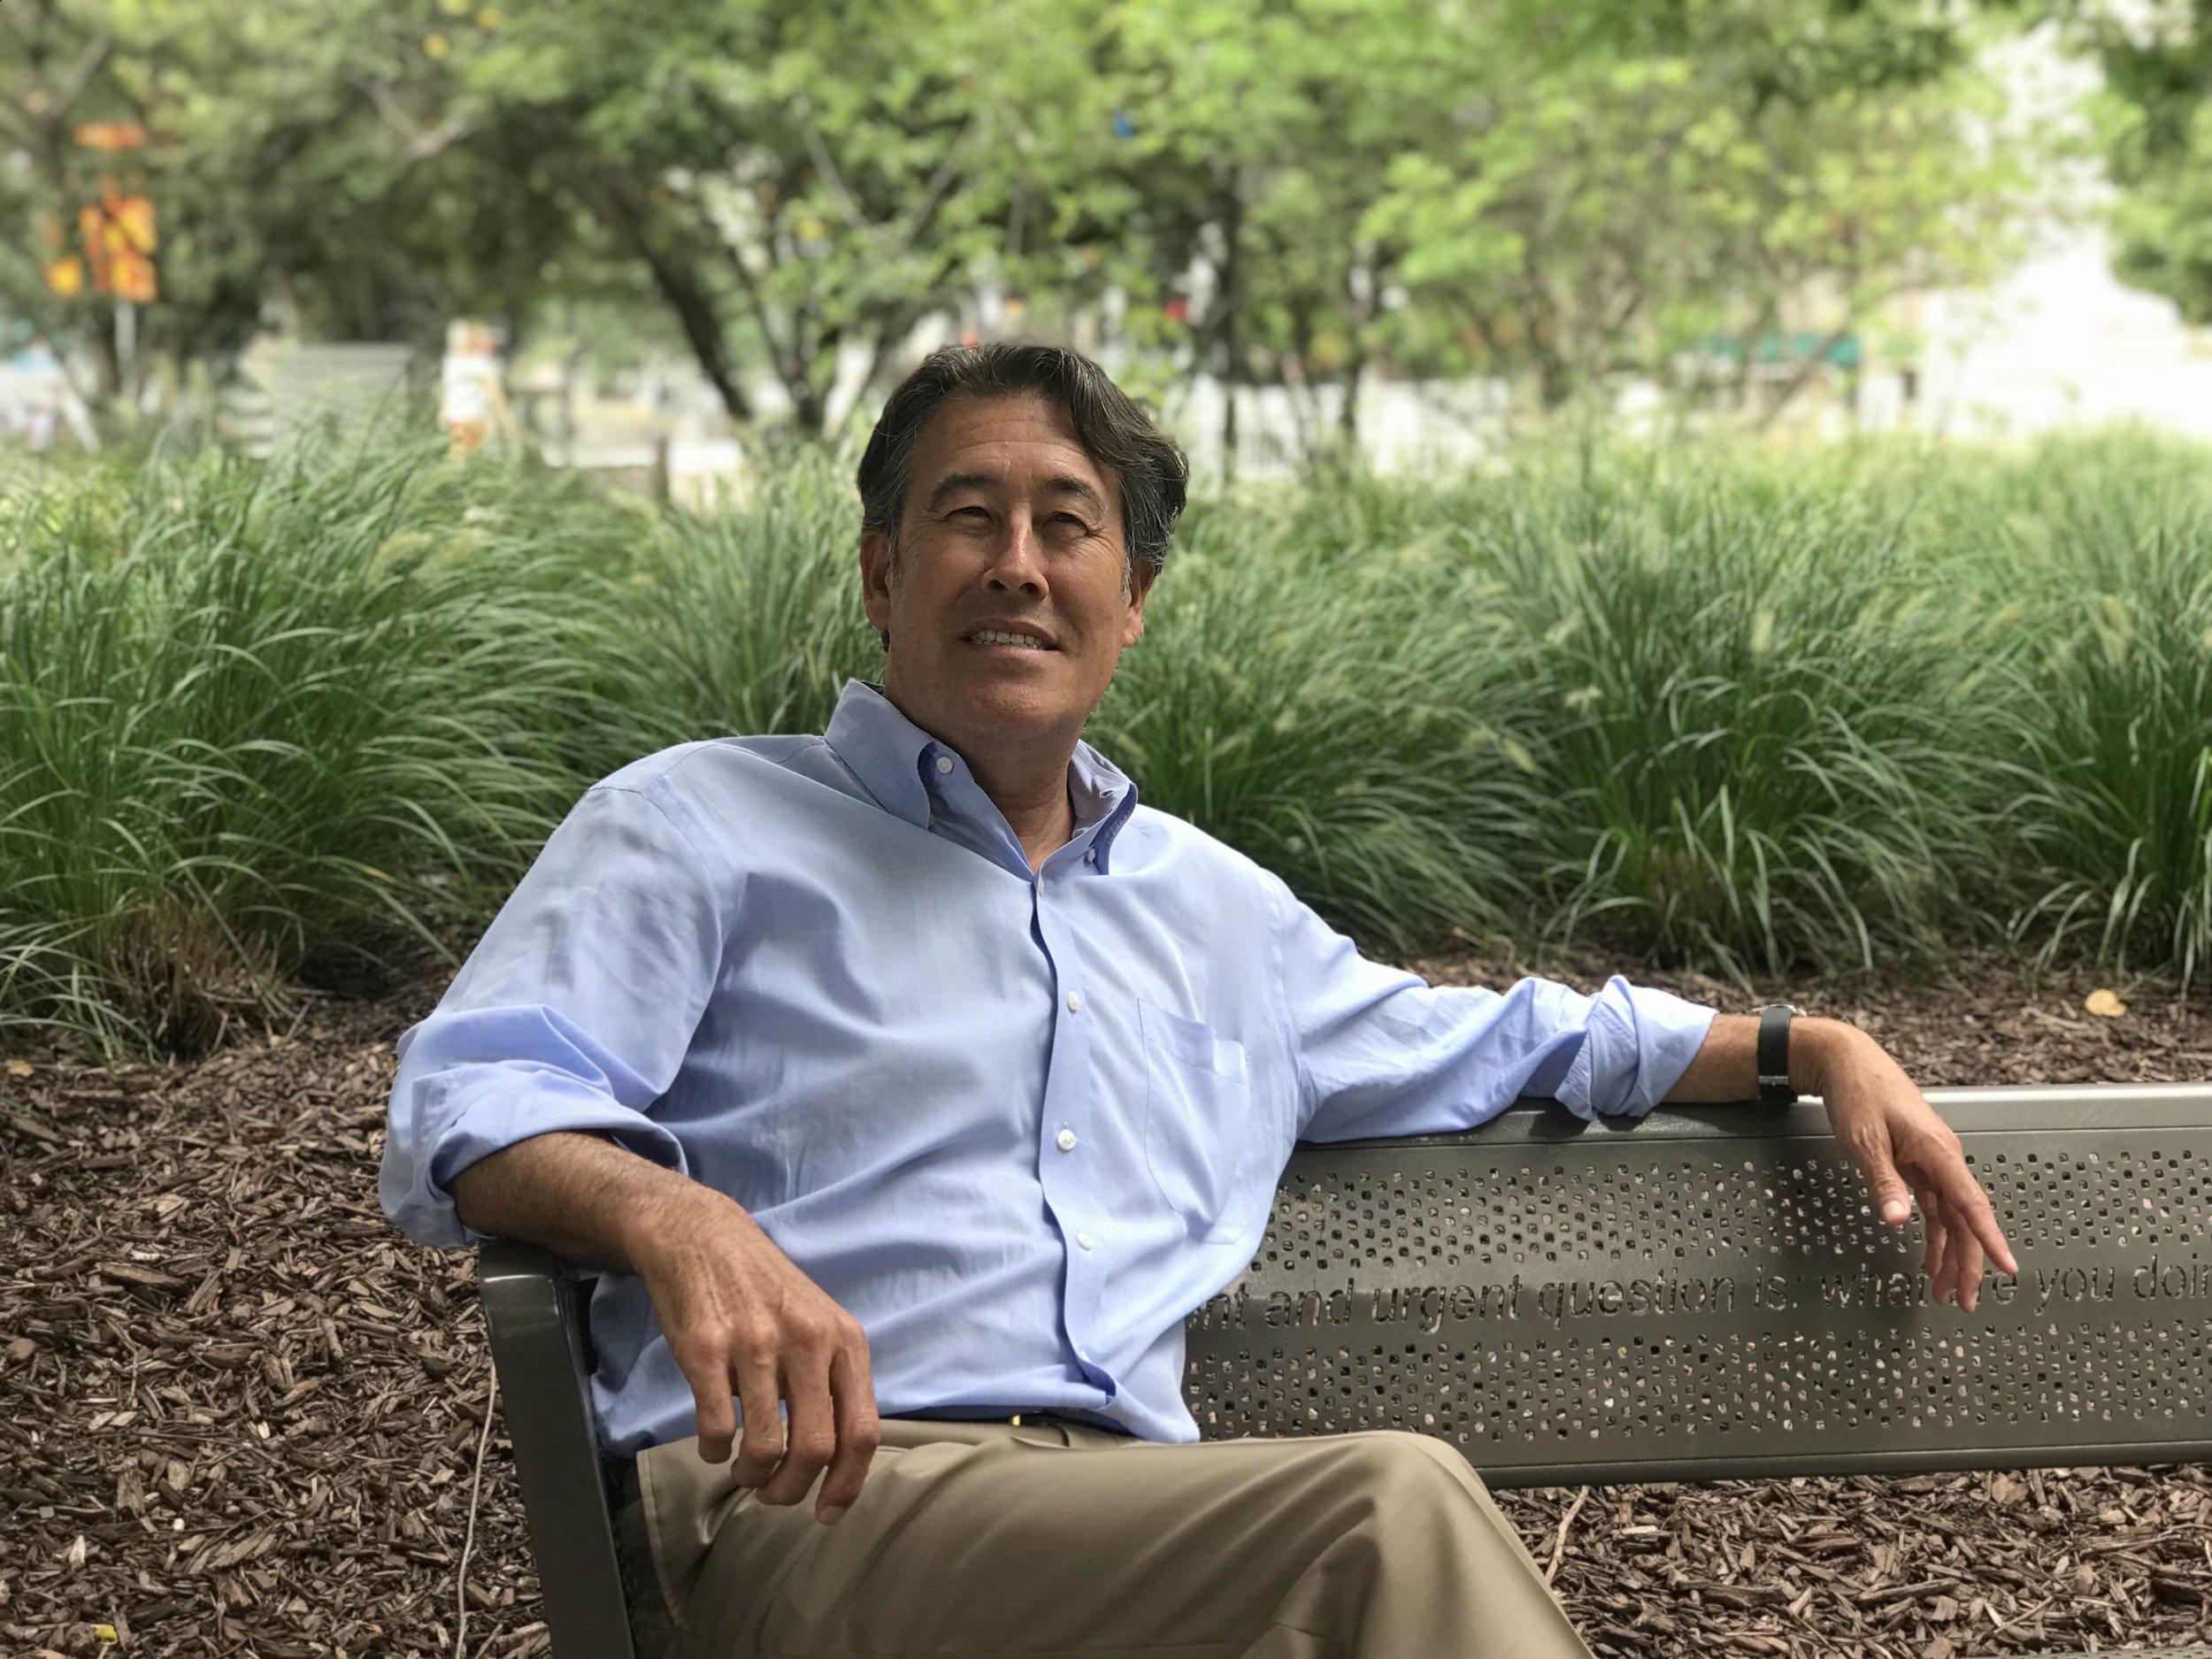 Felix G. Fukui   AIA, IIDA, NCARB, LEED AP